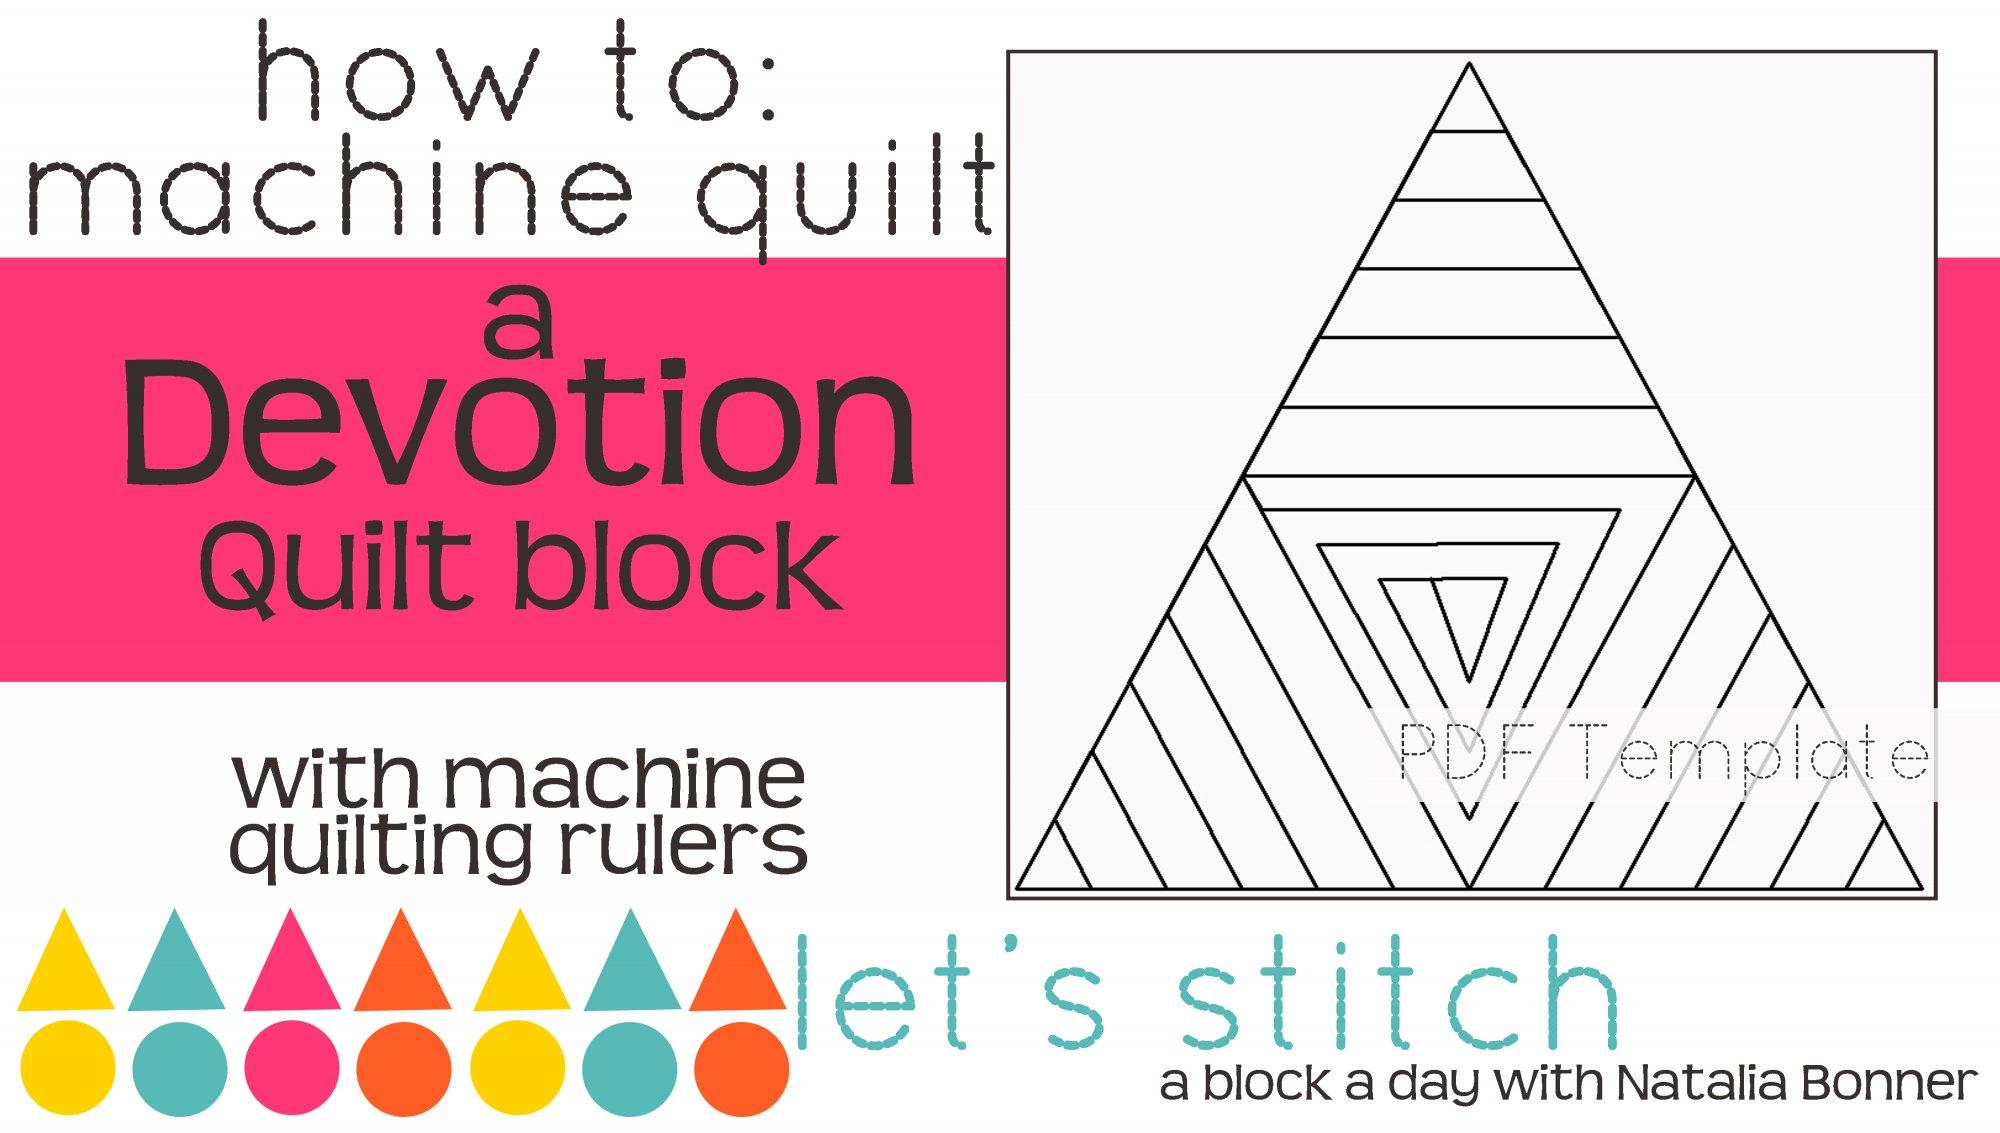 Let's Stitch - A Block a Day With Natalia Bonner - PDF - Devotion